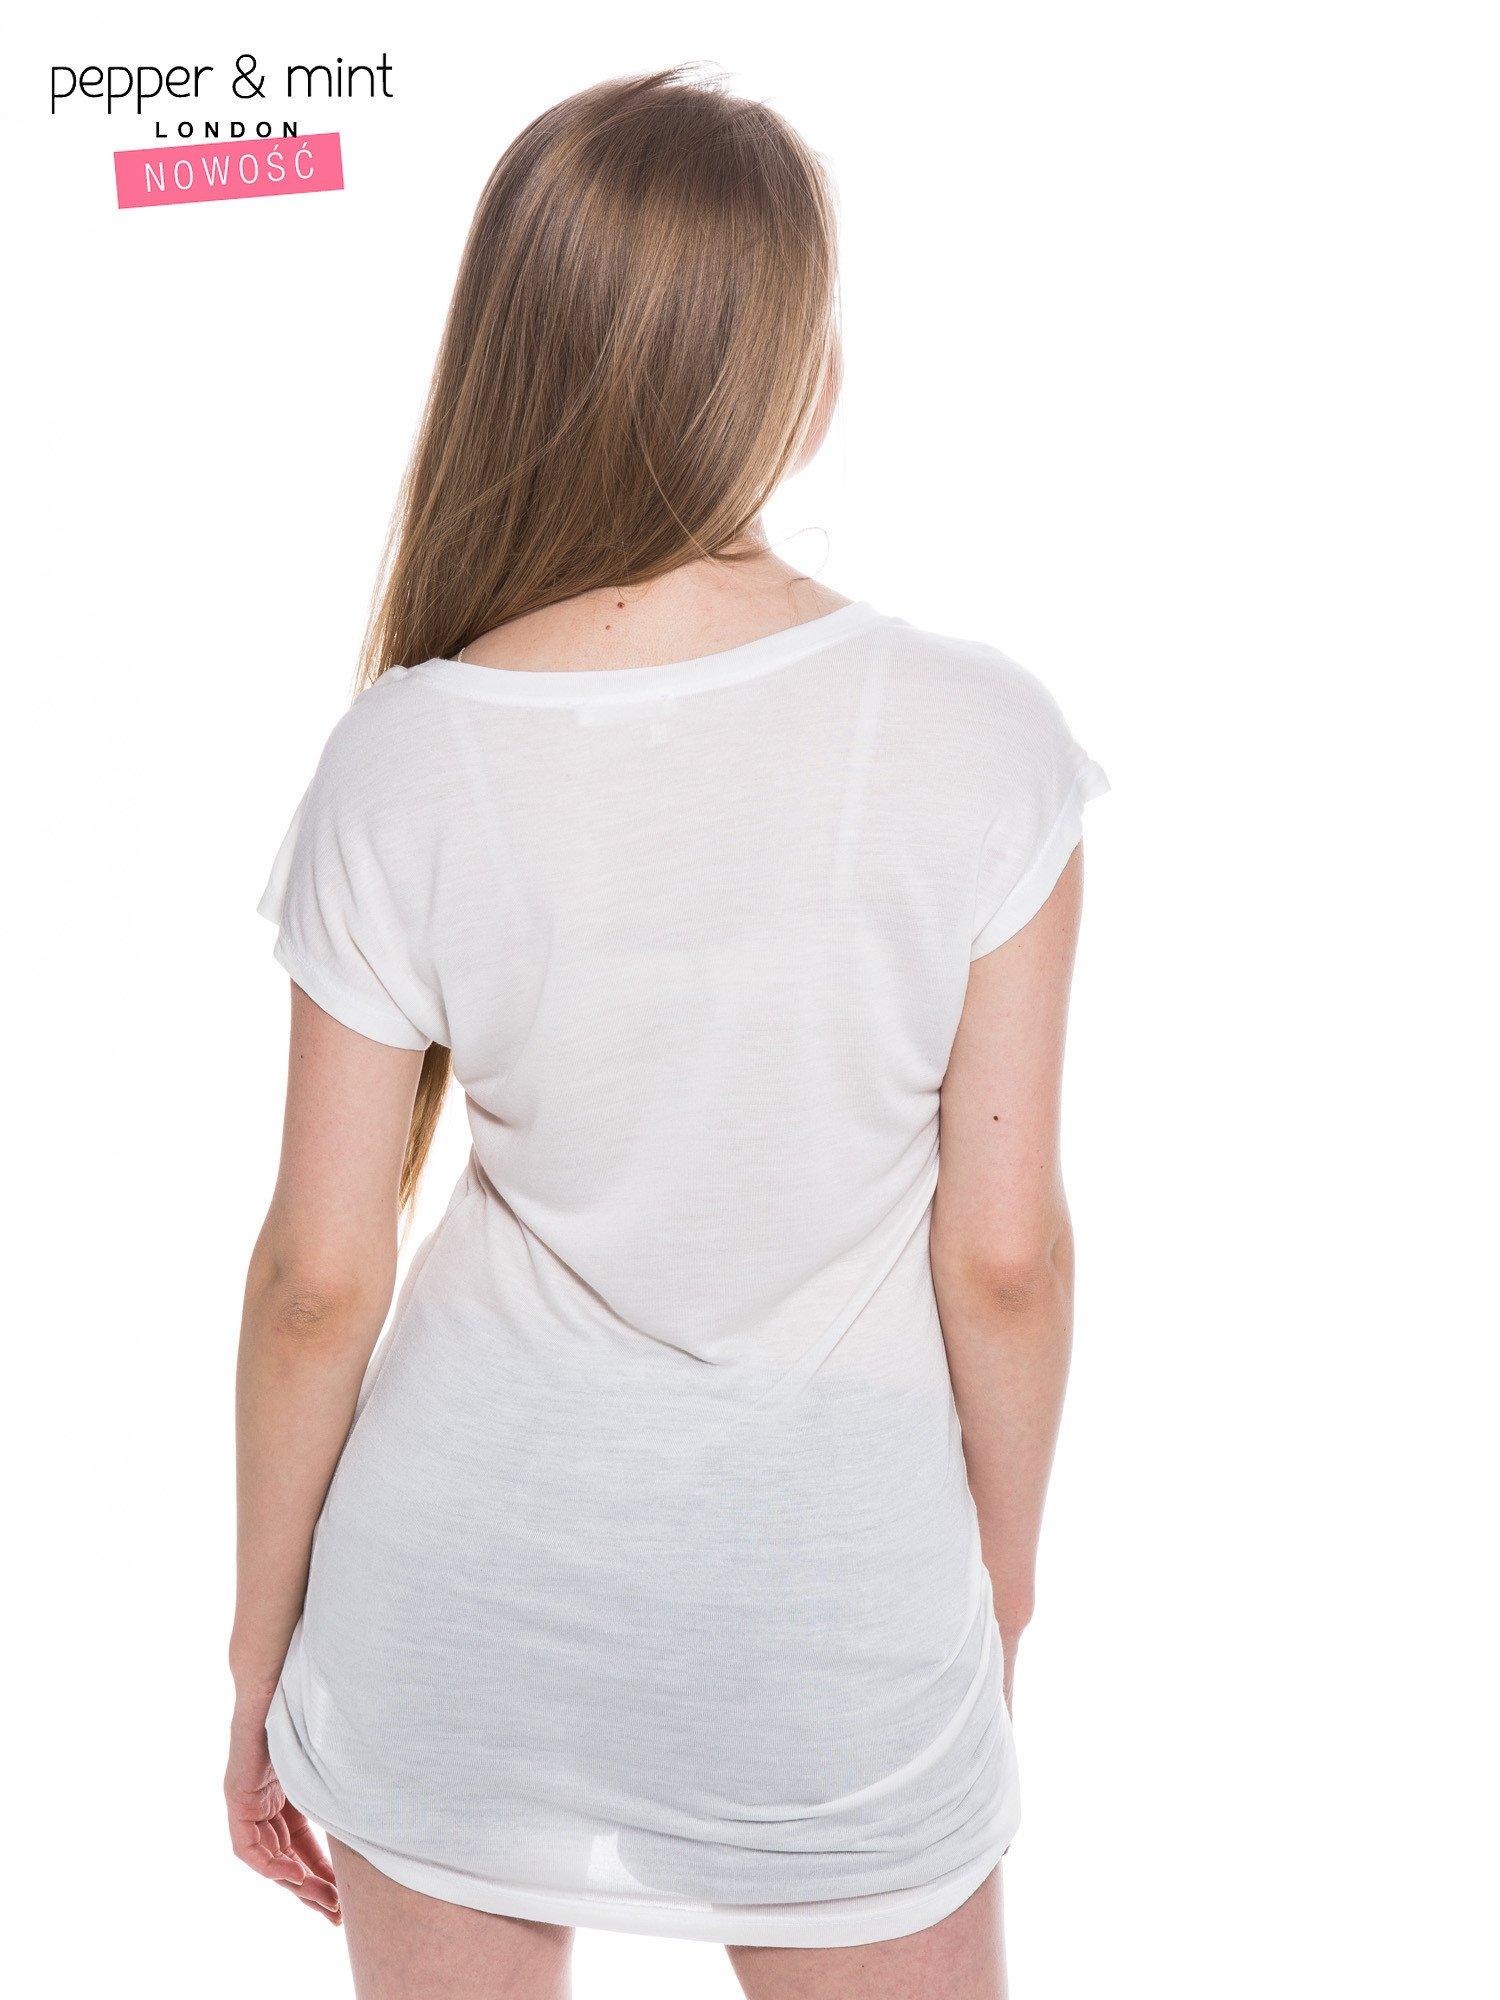 Biały t-shirt z nadrukiem YVES SAINT LAURENT                                  zdj.                                  3